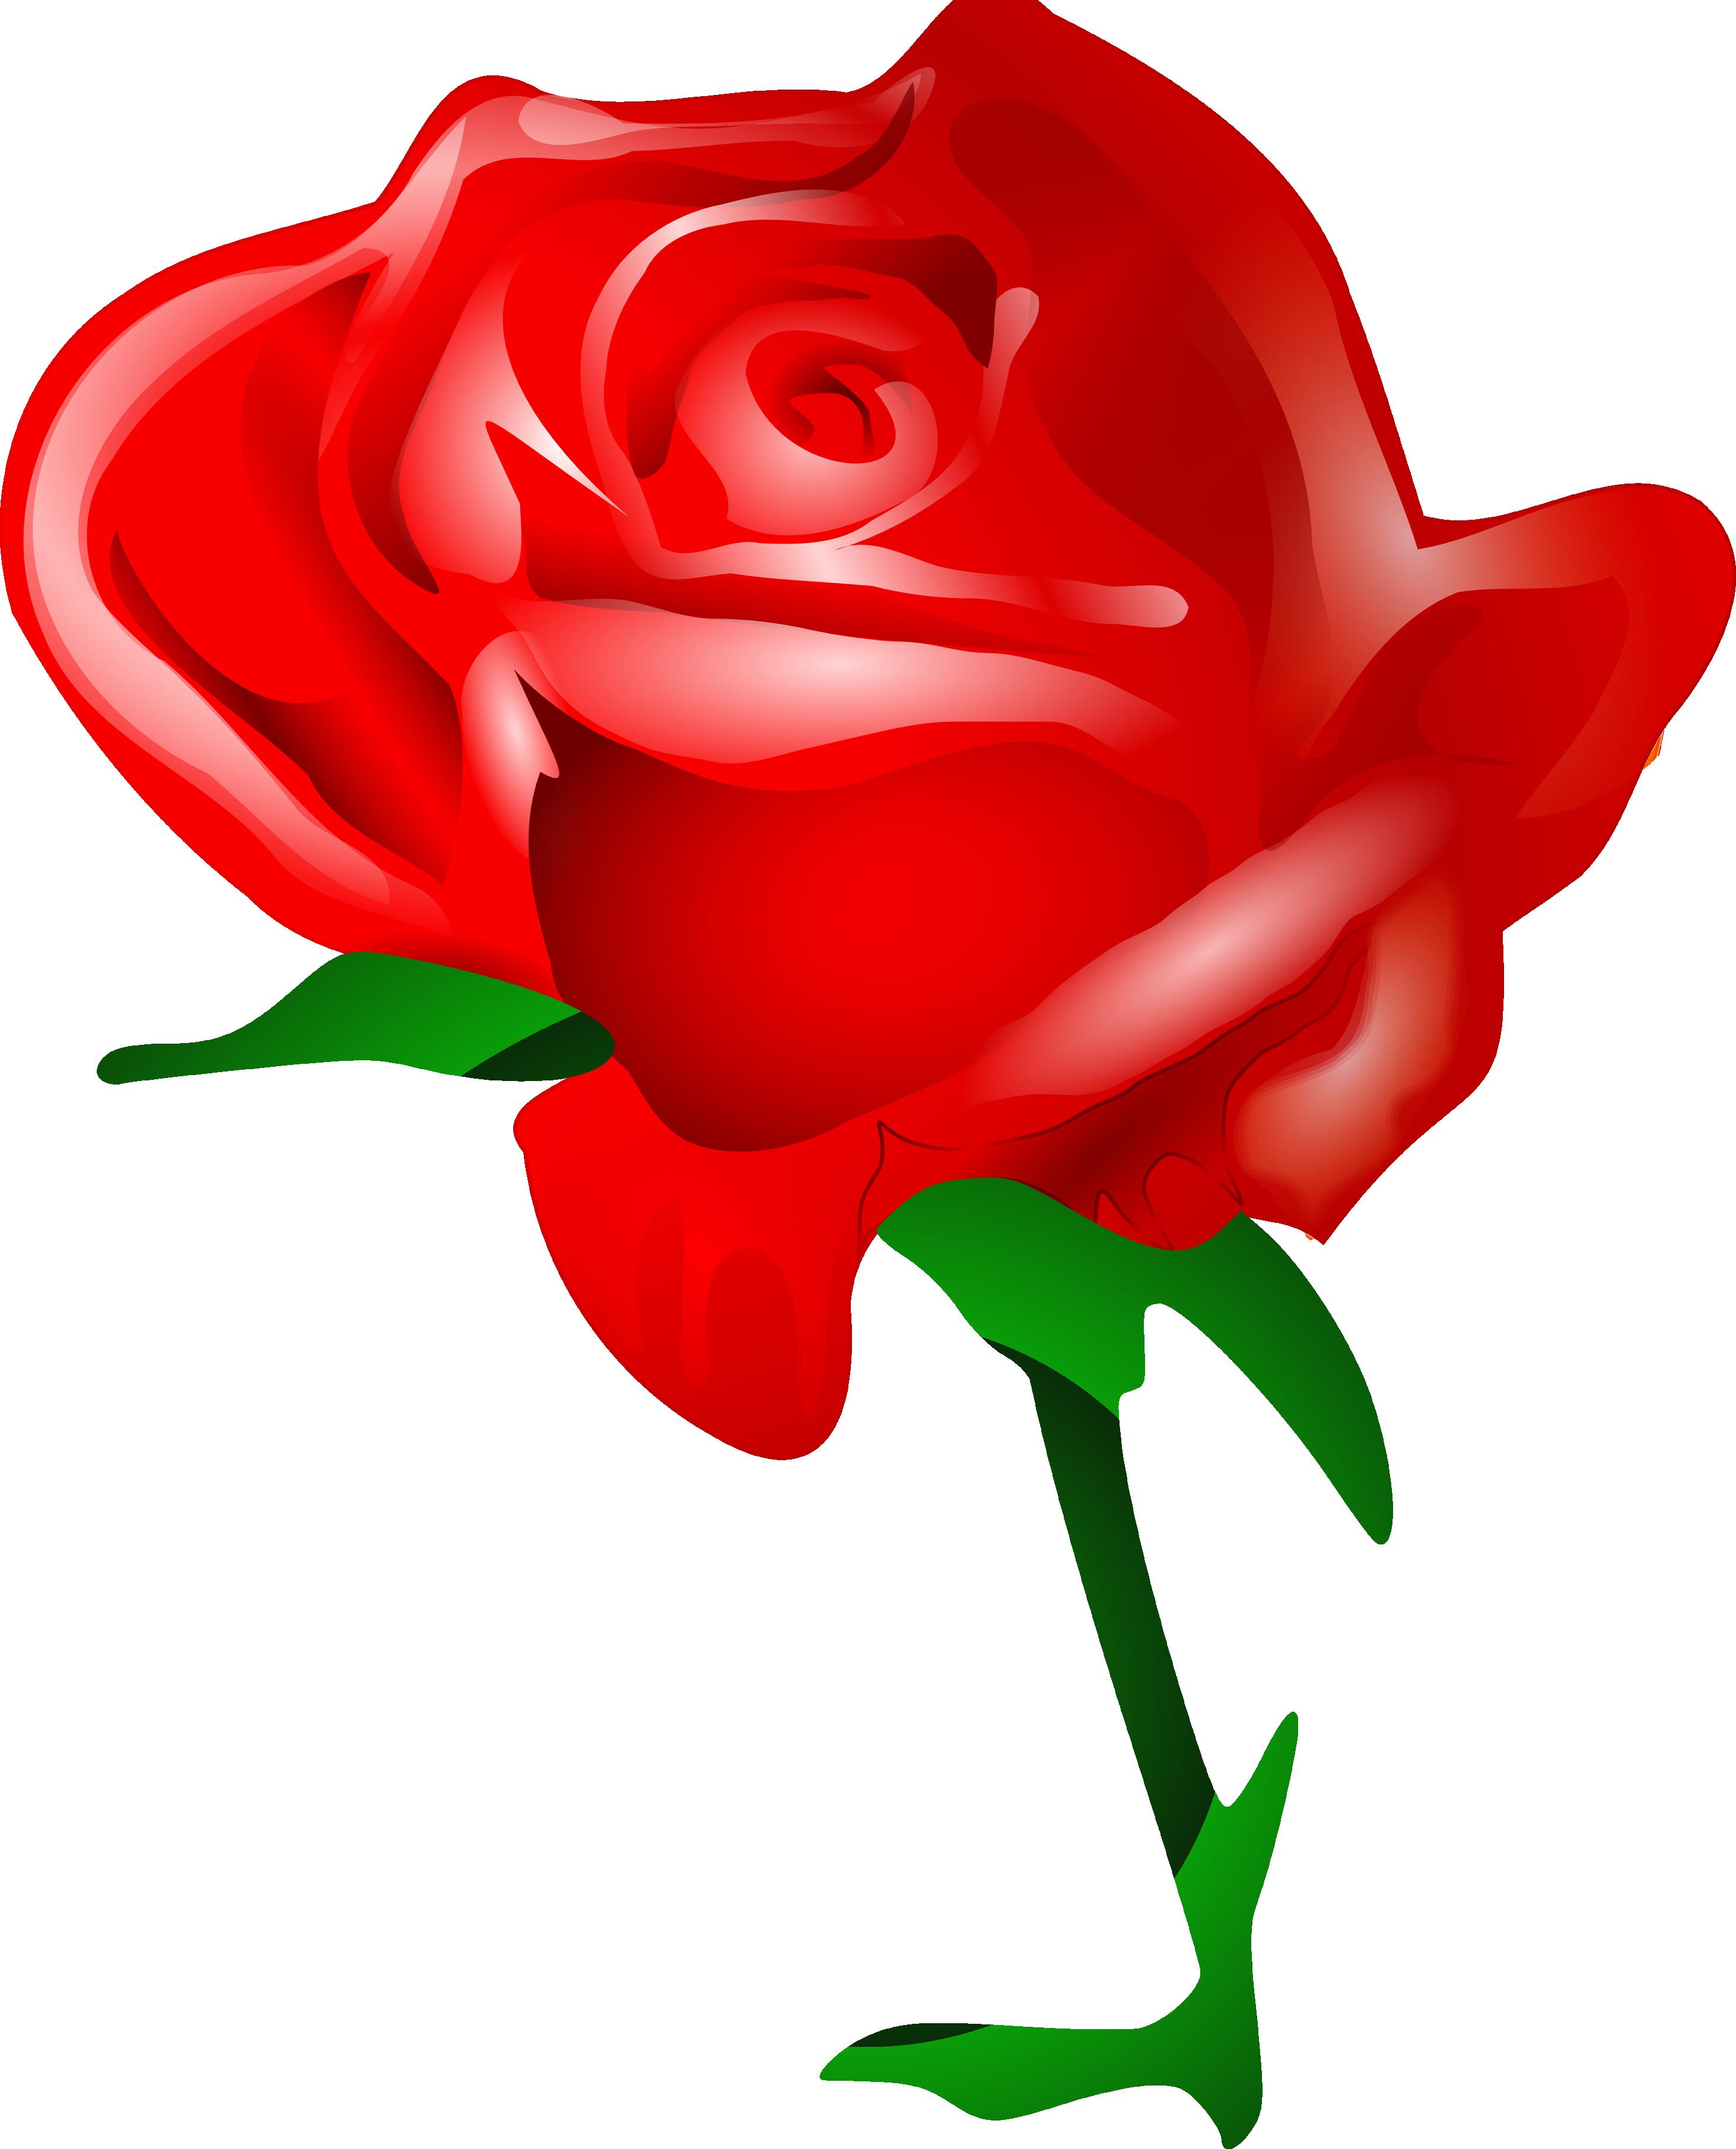 Mayflower clipart flowr. Rose png flower images